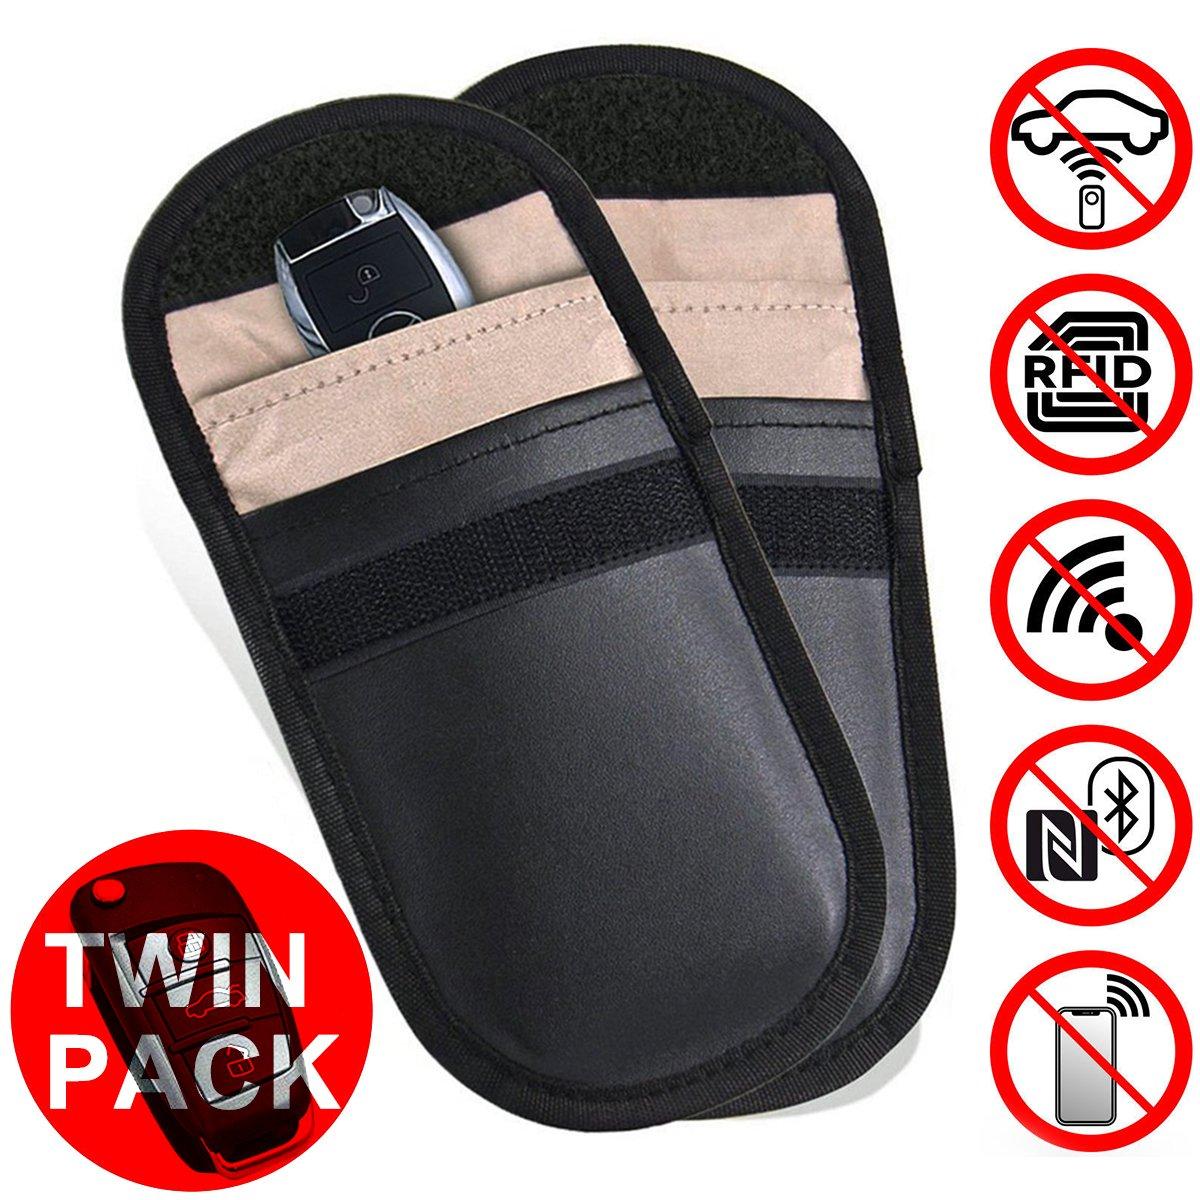 2PCS Black 4350414652 Dealpeak Car Keyless Signal Blocker Case Car Key FOB Protector Car Keyless Bag Credit Card Driver License Holder